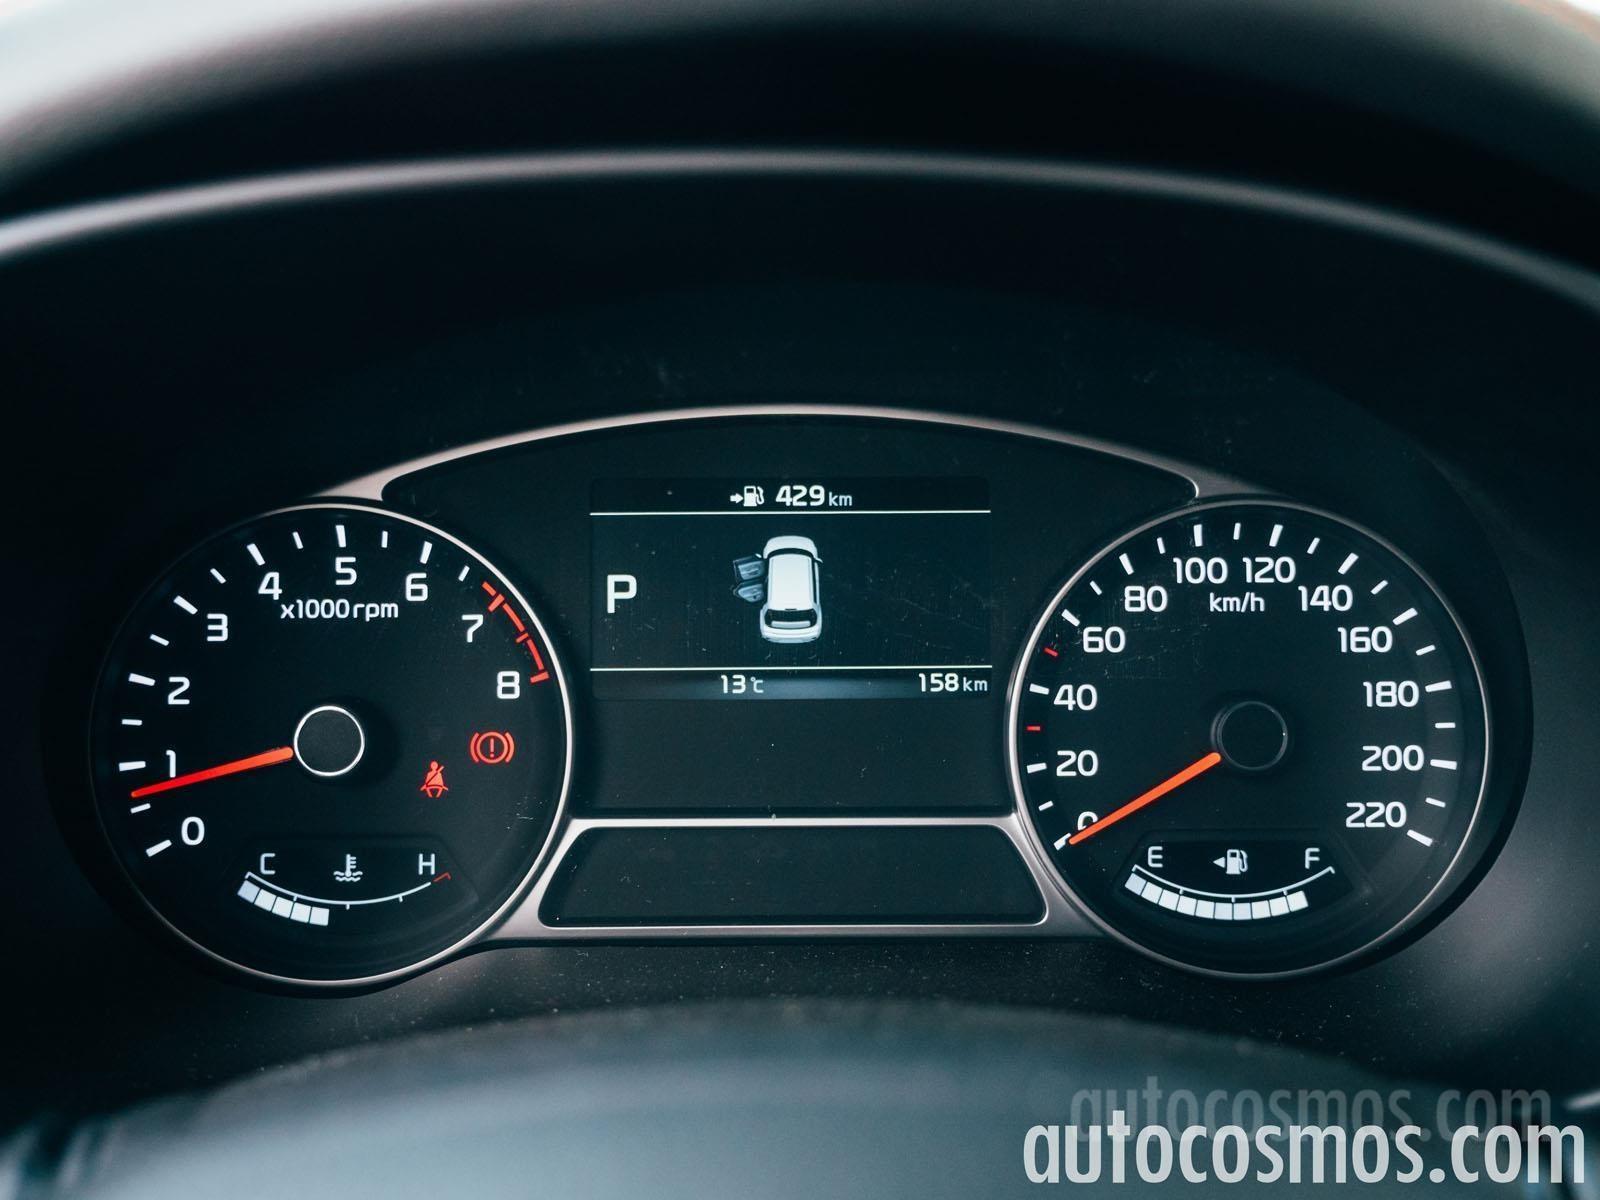 Manejamos el KIA SOUL Turbo 2017 - Autocosmos.com